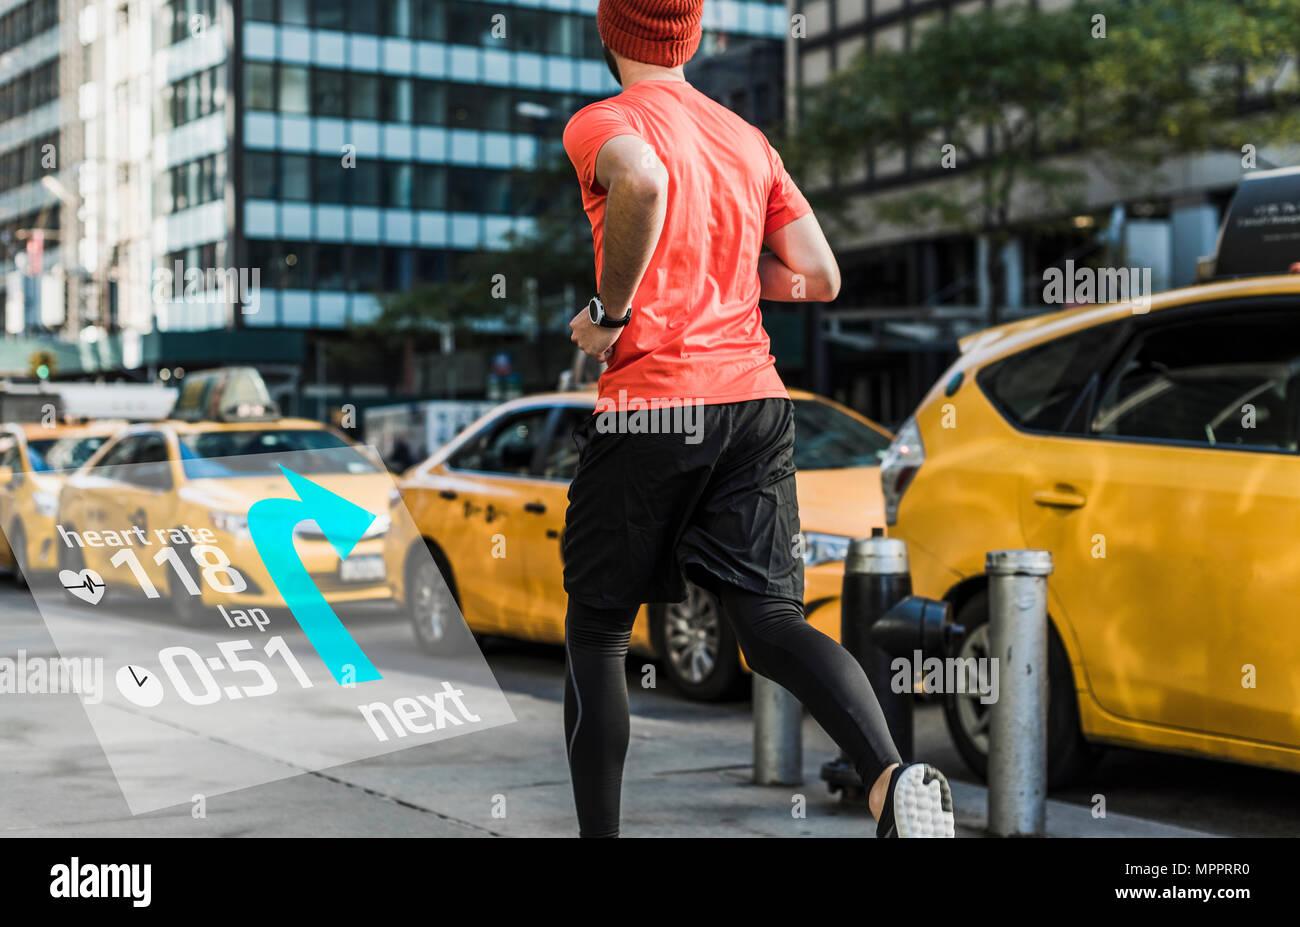 USA, New York City, man running in the city with data around him - Stock Image